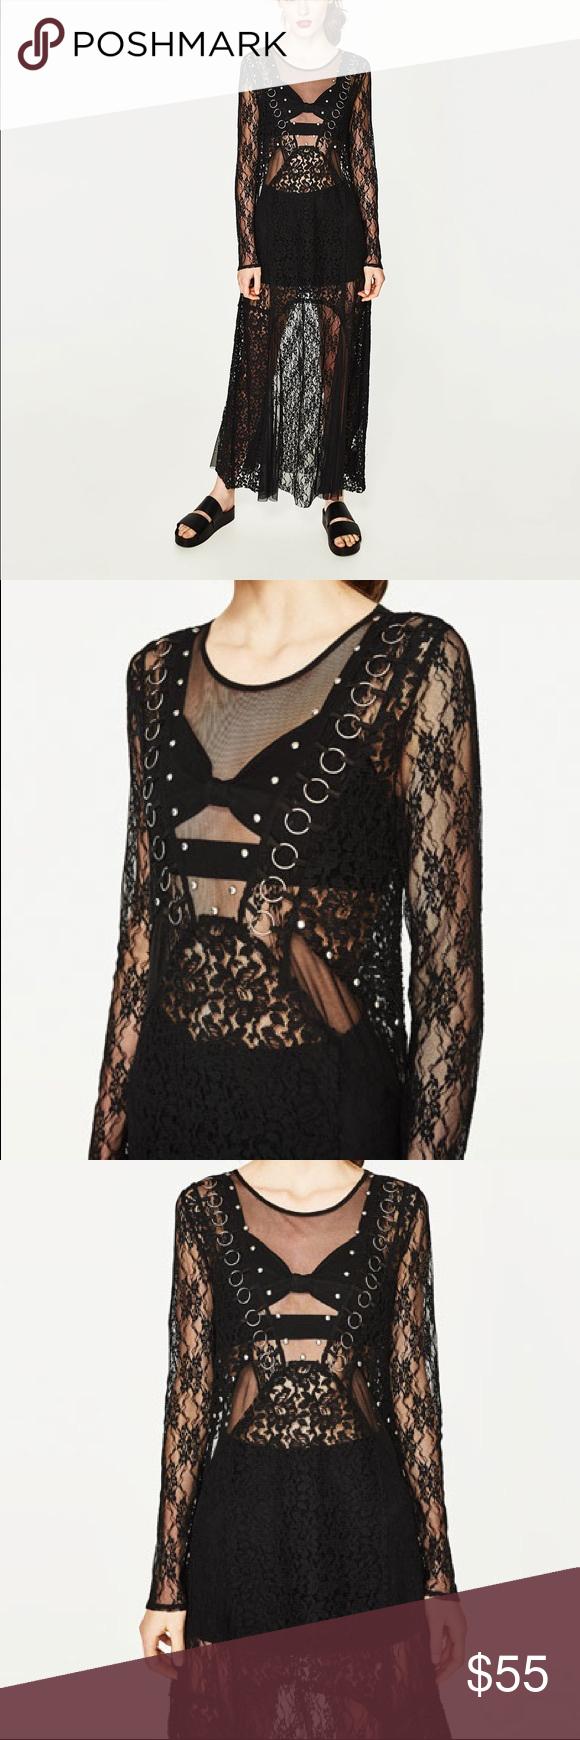 ba2df0ed49 Zara TRF black long lace dress Great dress for Halloween season..... look  sexy or mysterious or rocker chic depending on pairing.... sheer dress